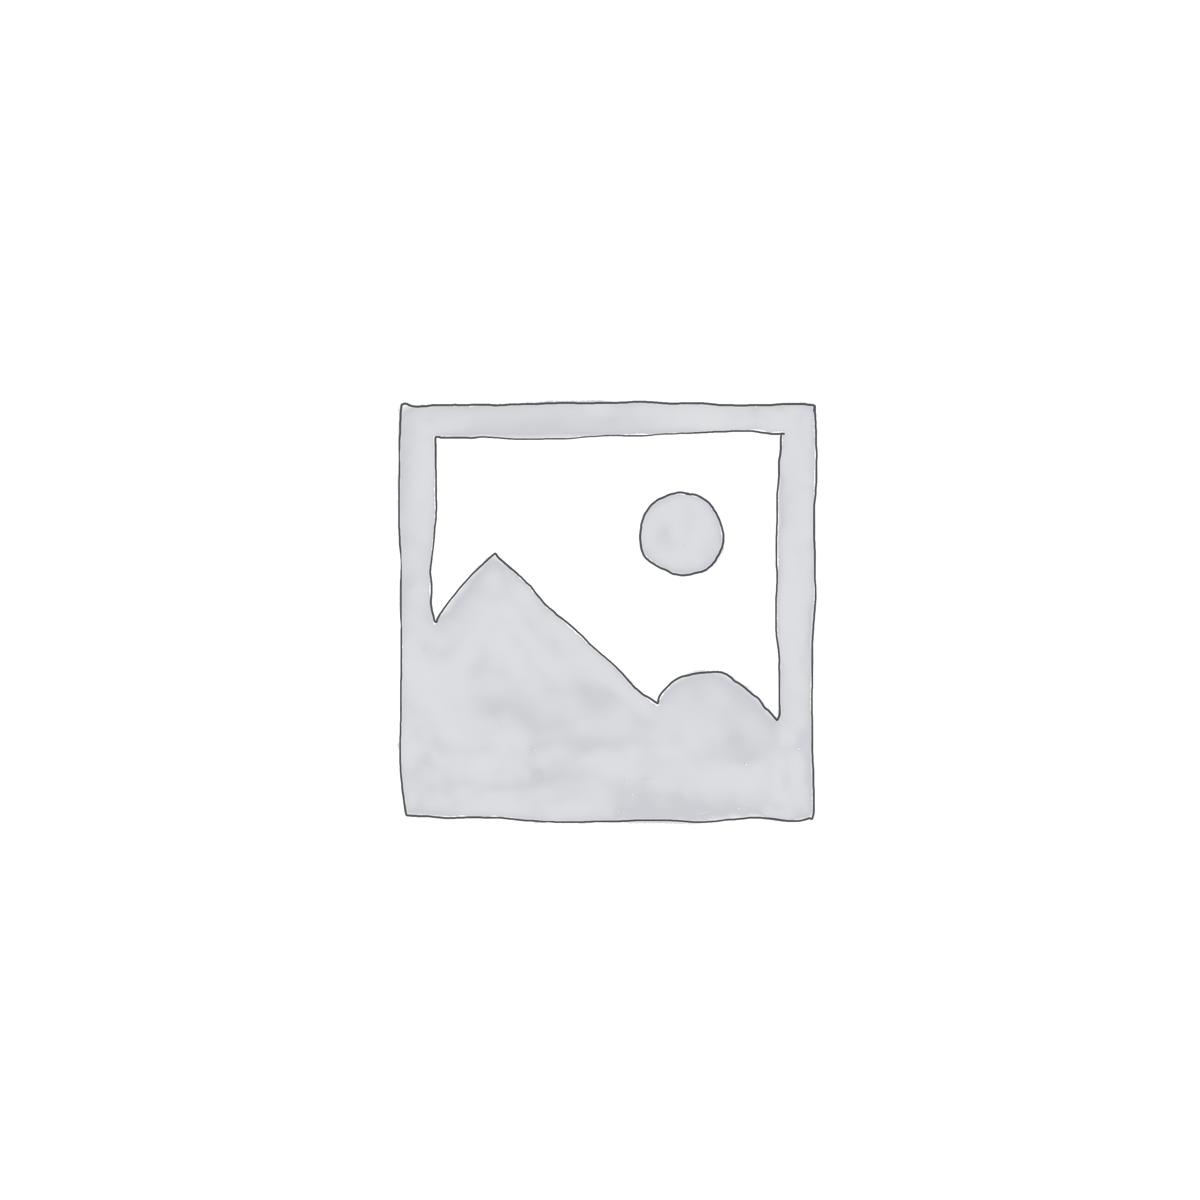 Soft Floral with Horned Deer Wallpaper Mural